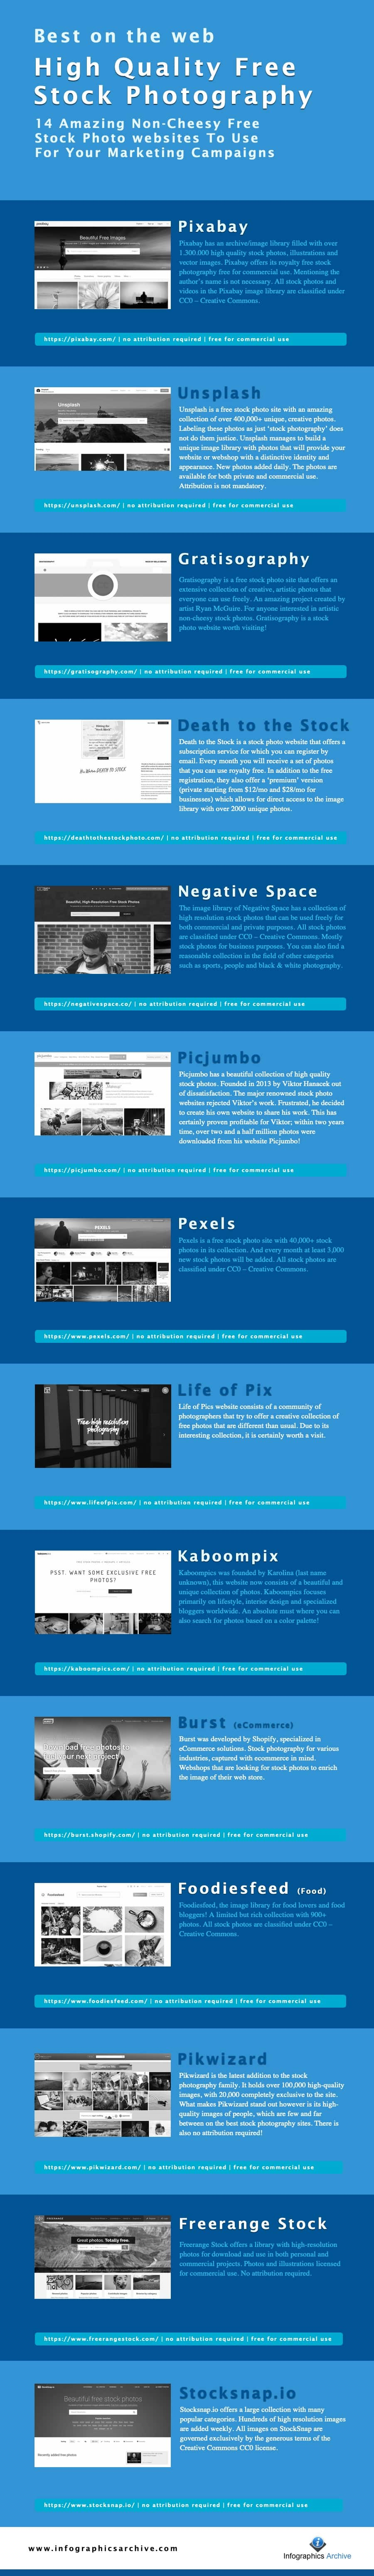 14 amazing free stock photo websites